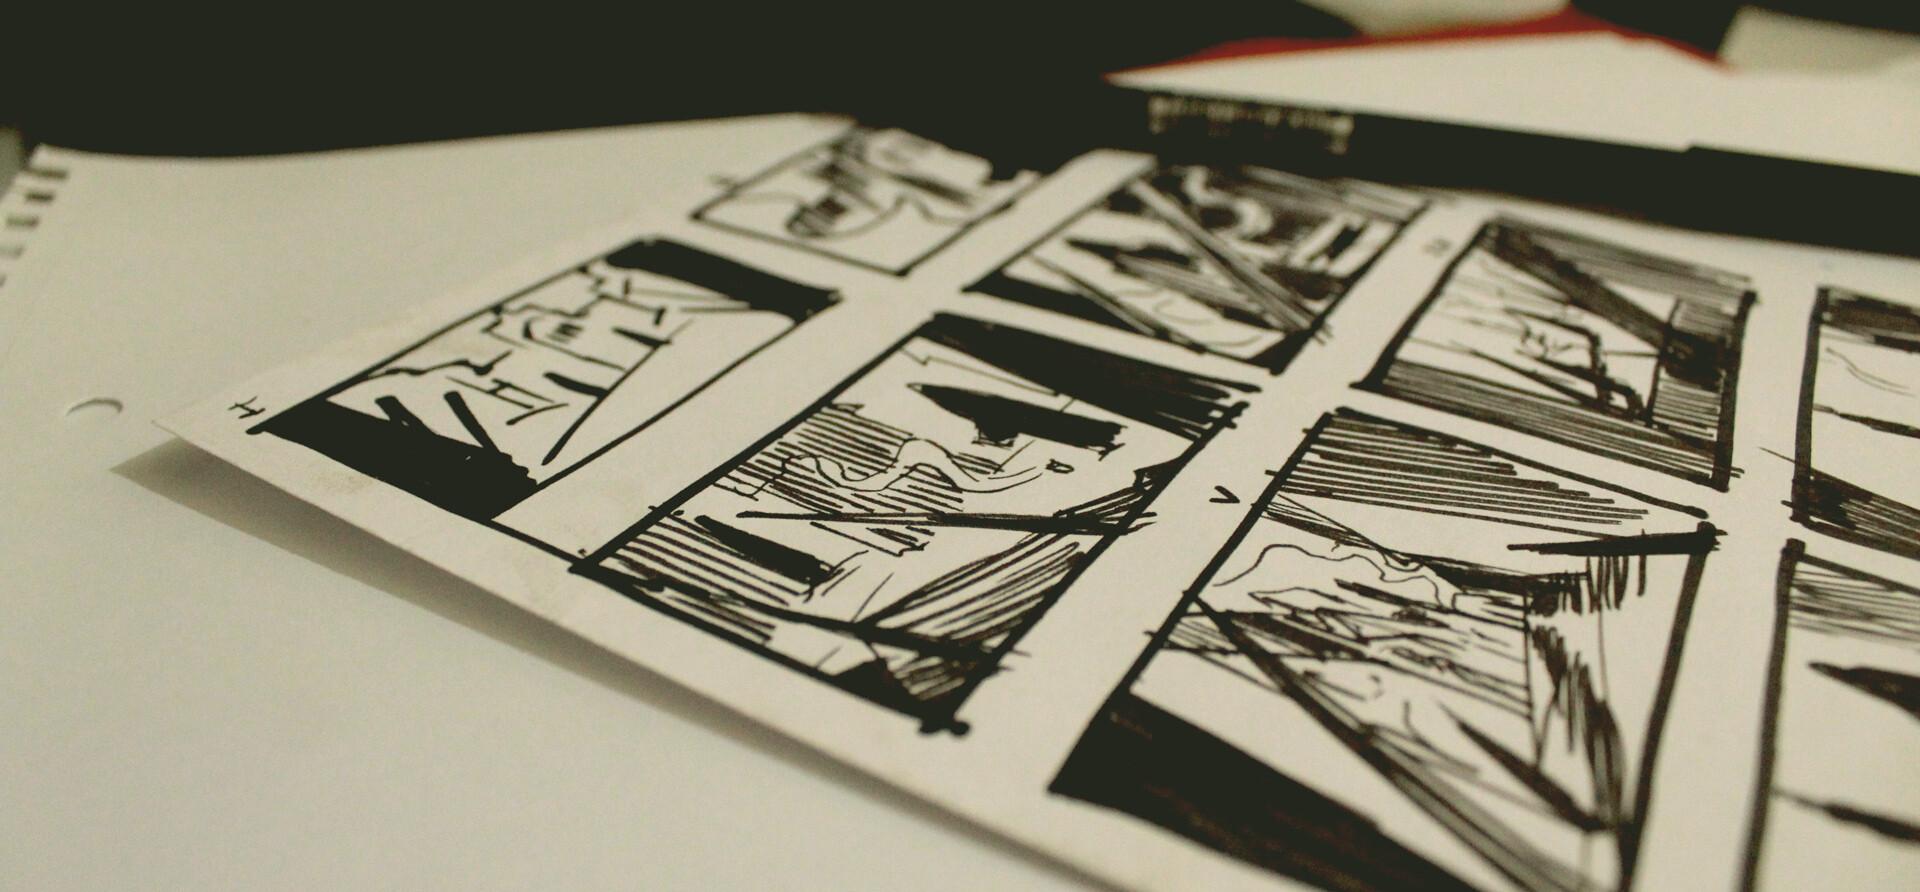 Rough compositional sketches